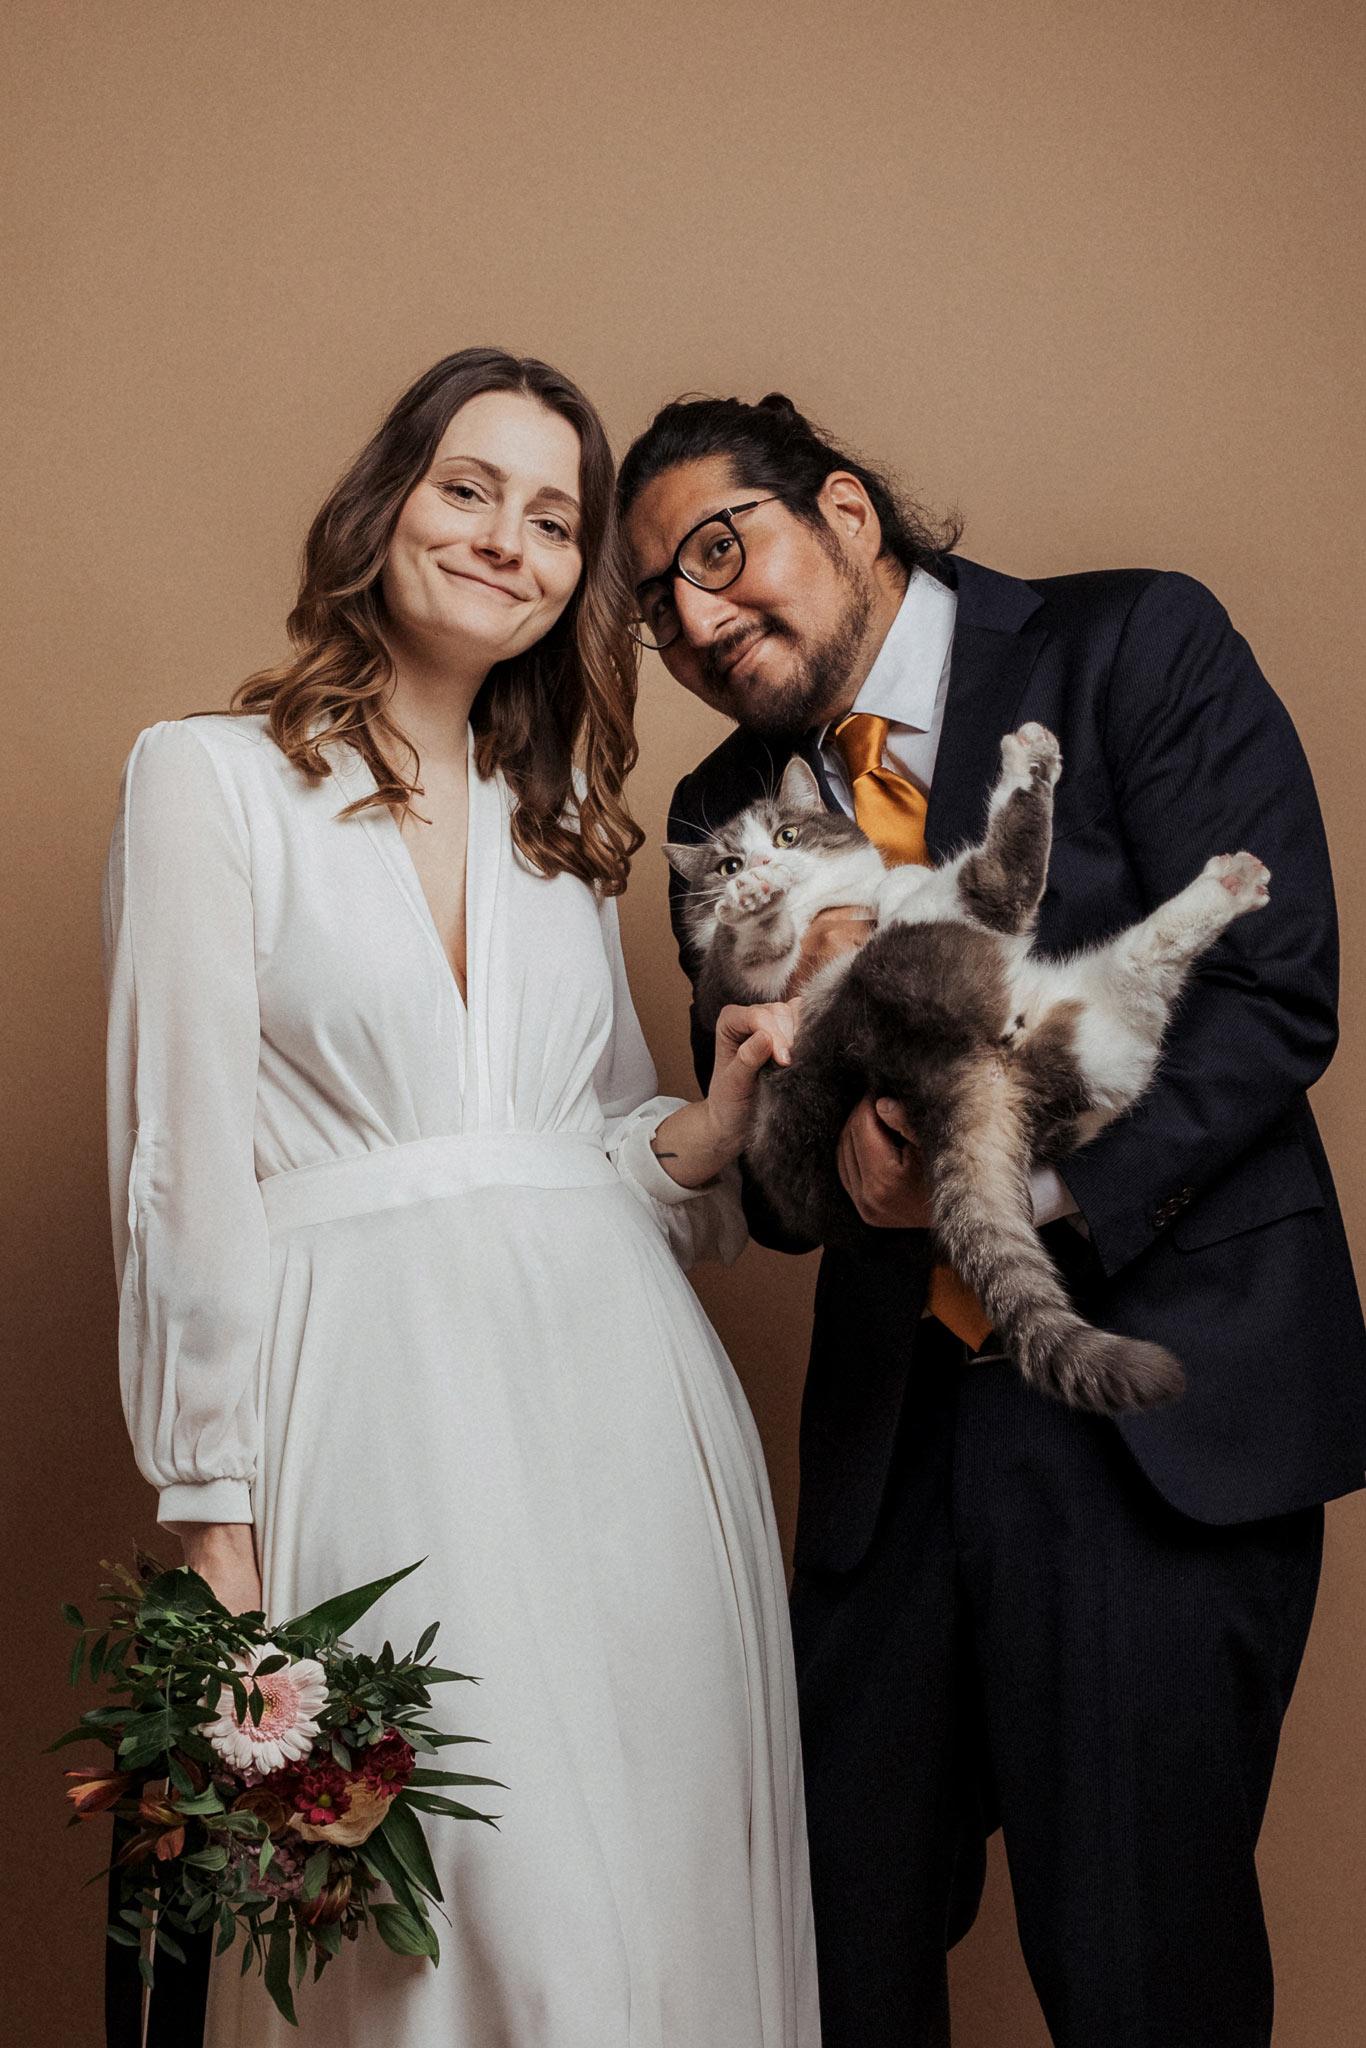 Brautpaar mit Haustier im Studio fotografiert